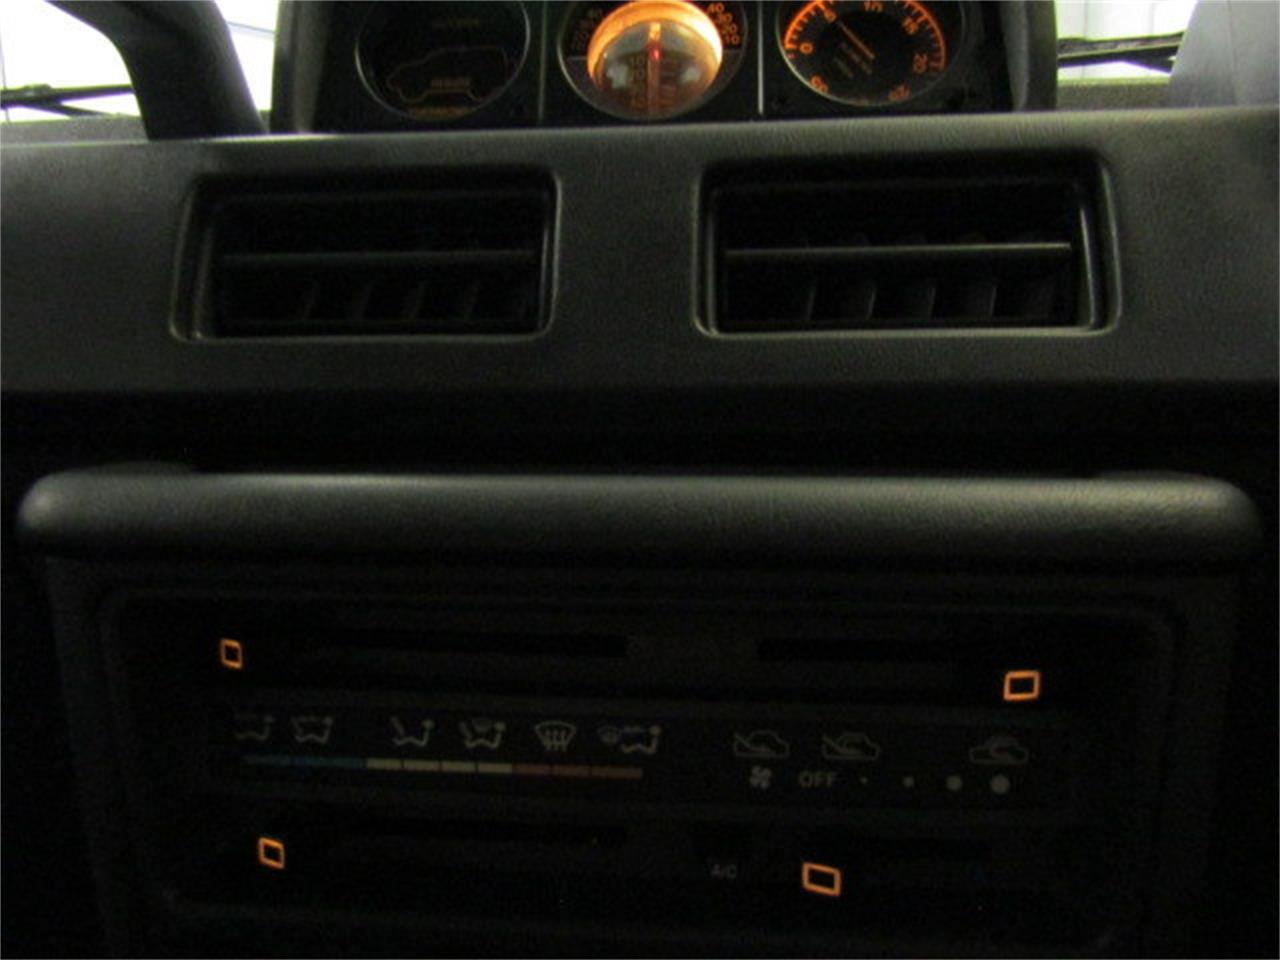 Large Picture of '89 Mitsubishi Pajero located in Christiansburg Virginia - $8,900.00 - LI1X